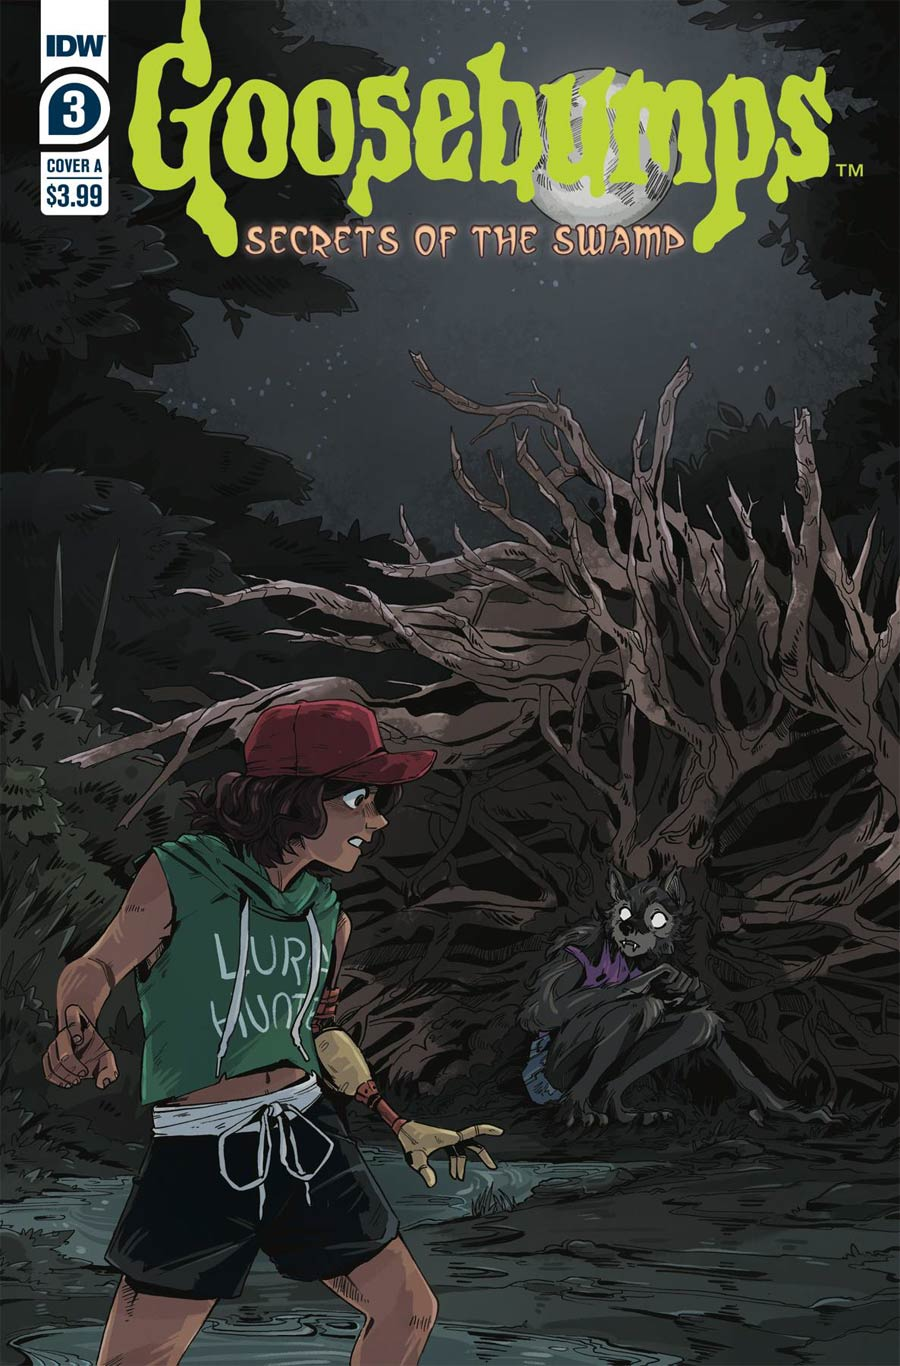 Goosebumps Secrets Of The Swamp #3 Cover A Regular Bill Underwood Cover